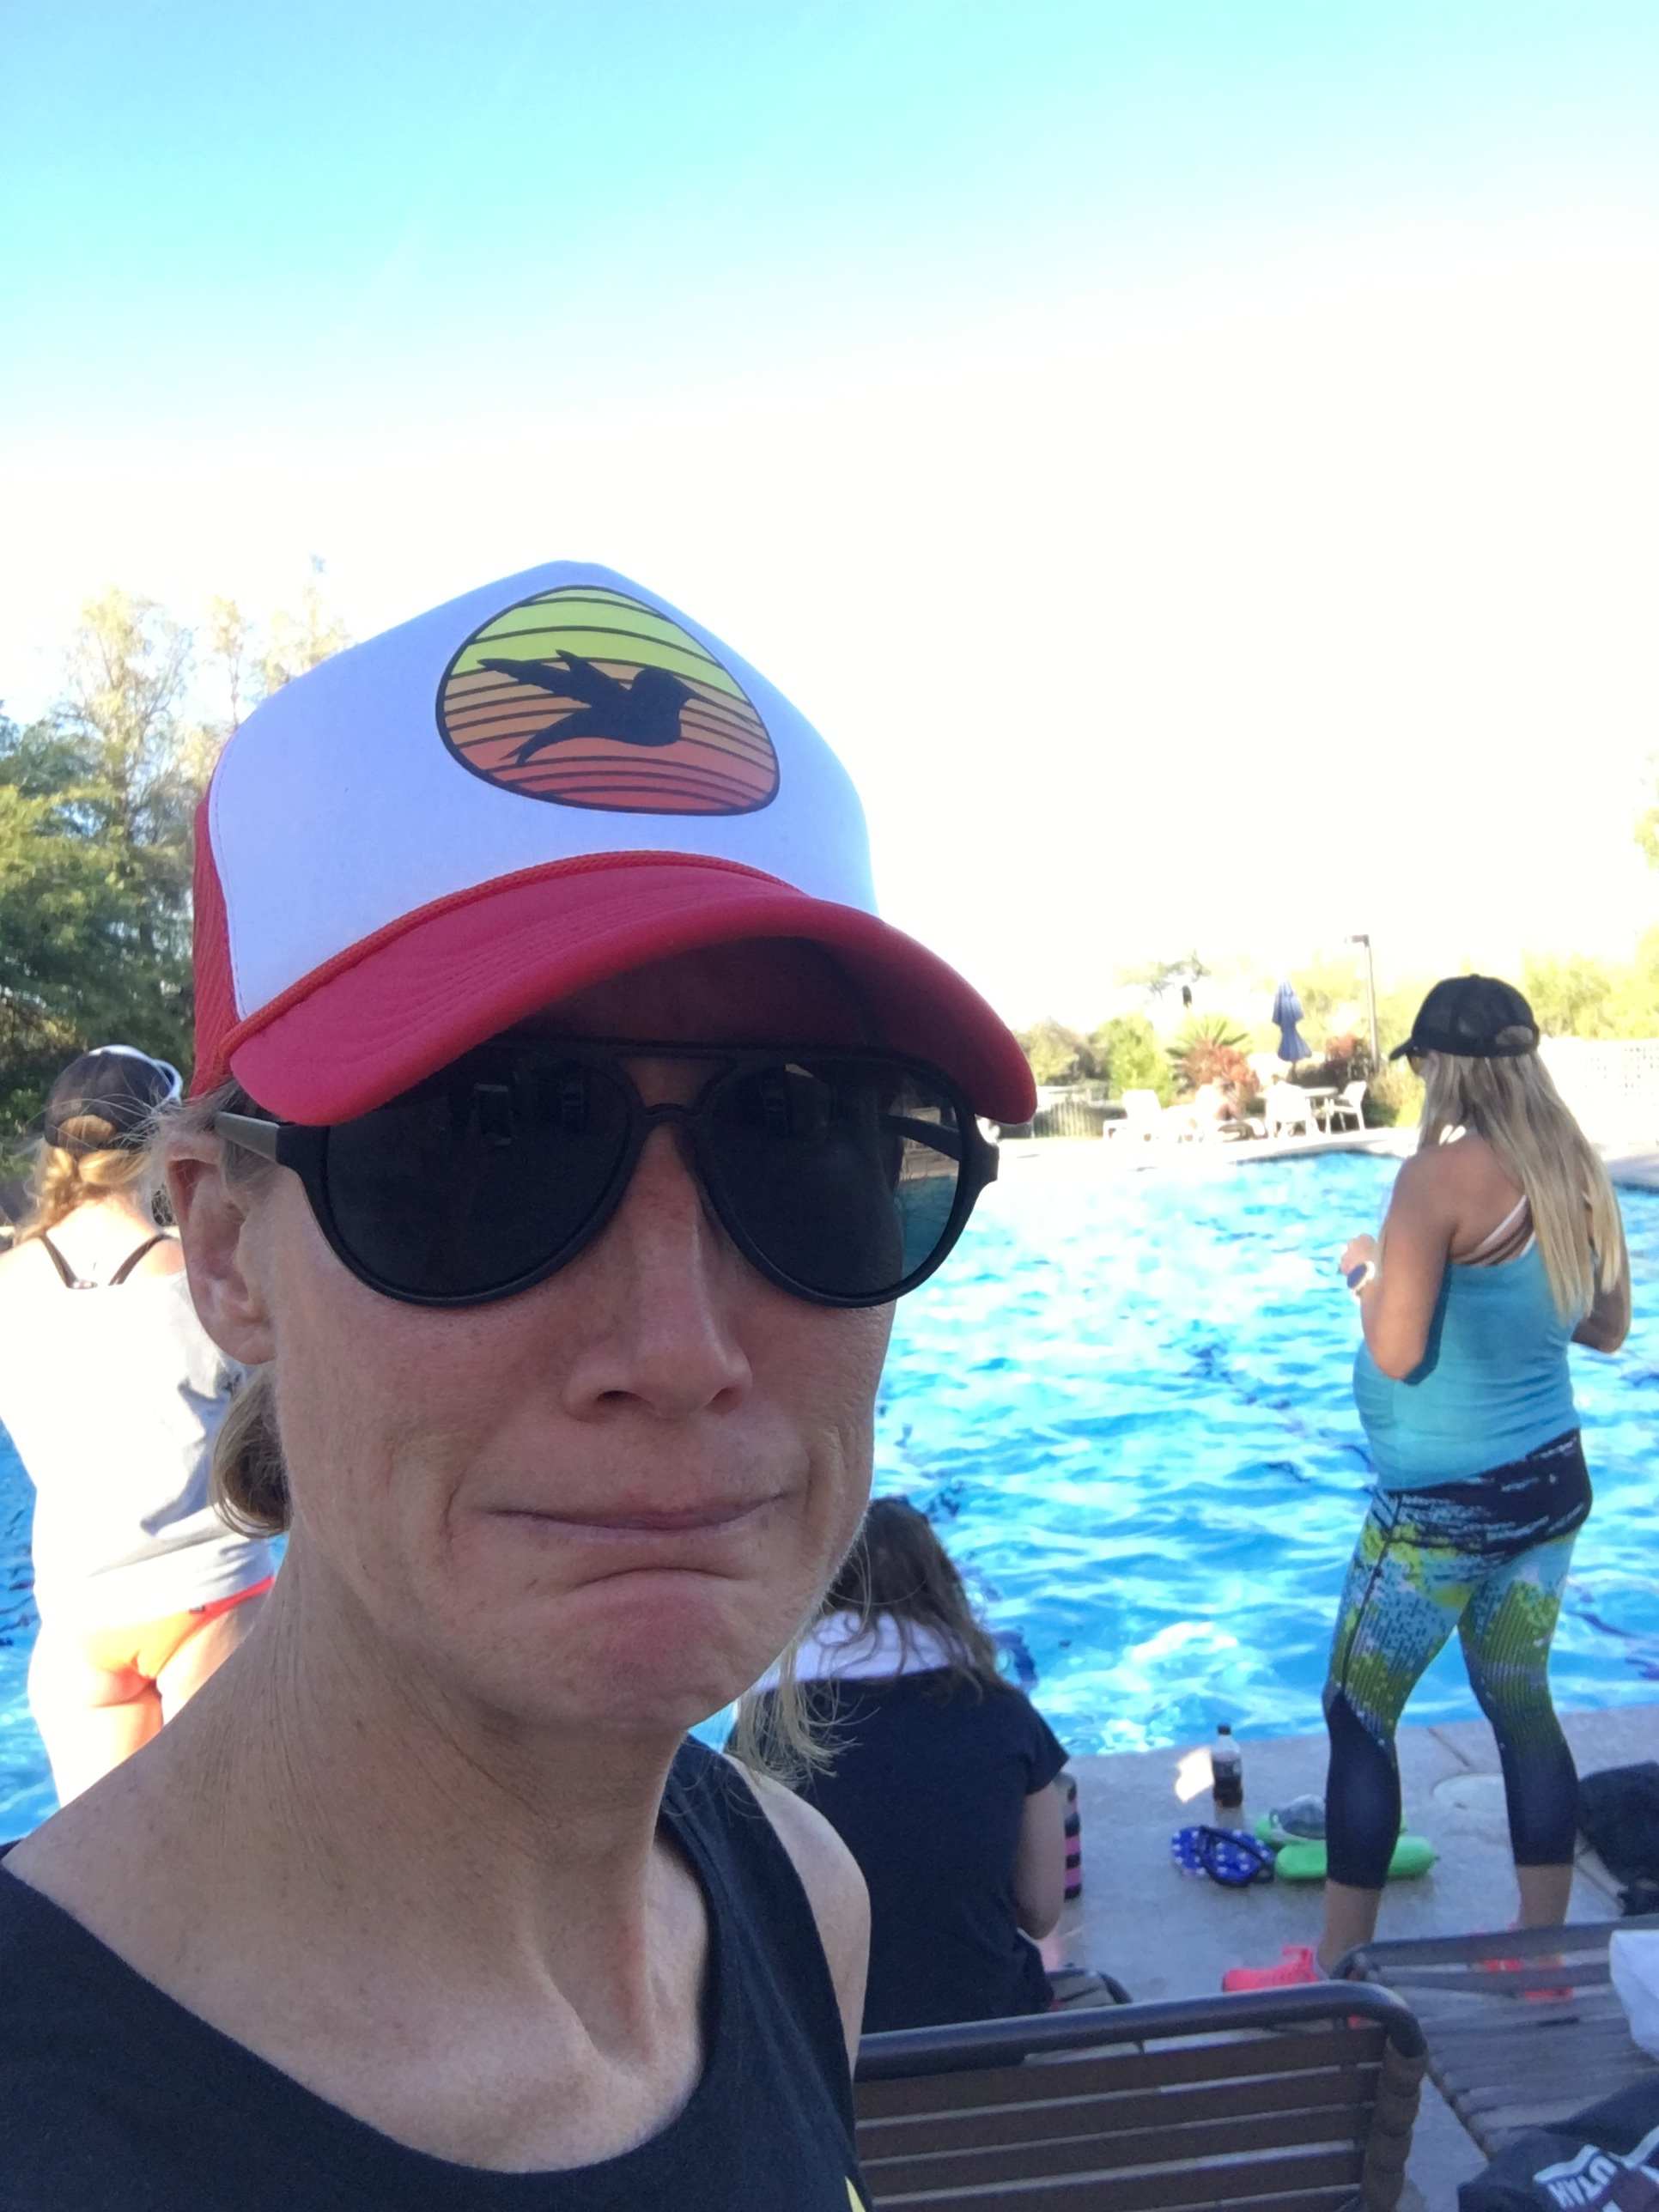 Just before the swim skills session.